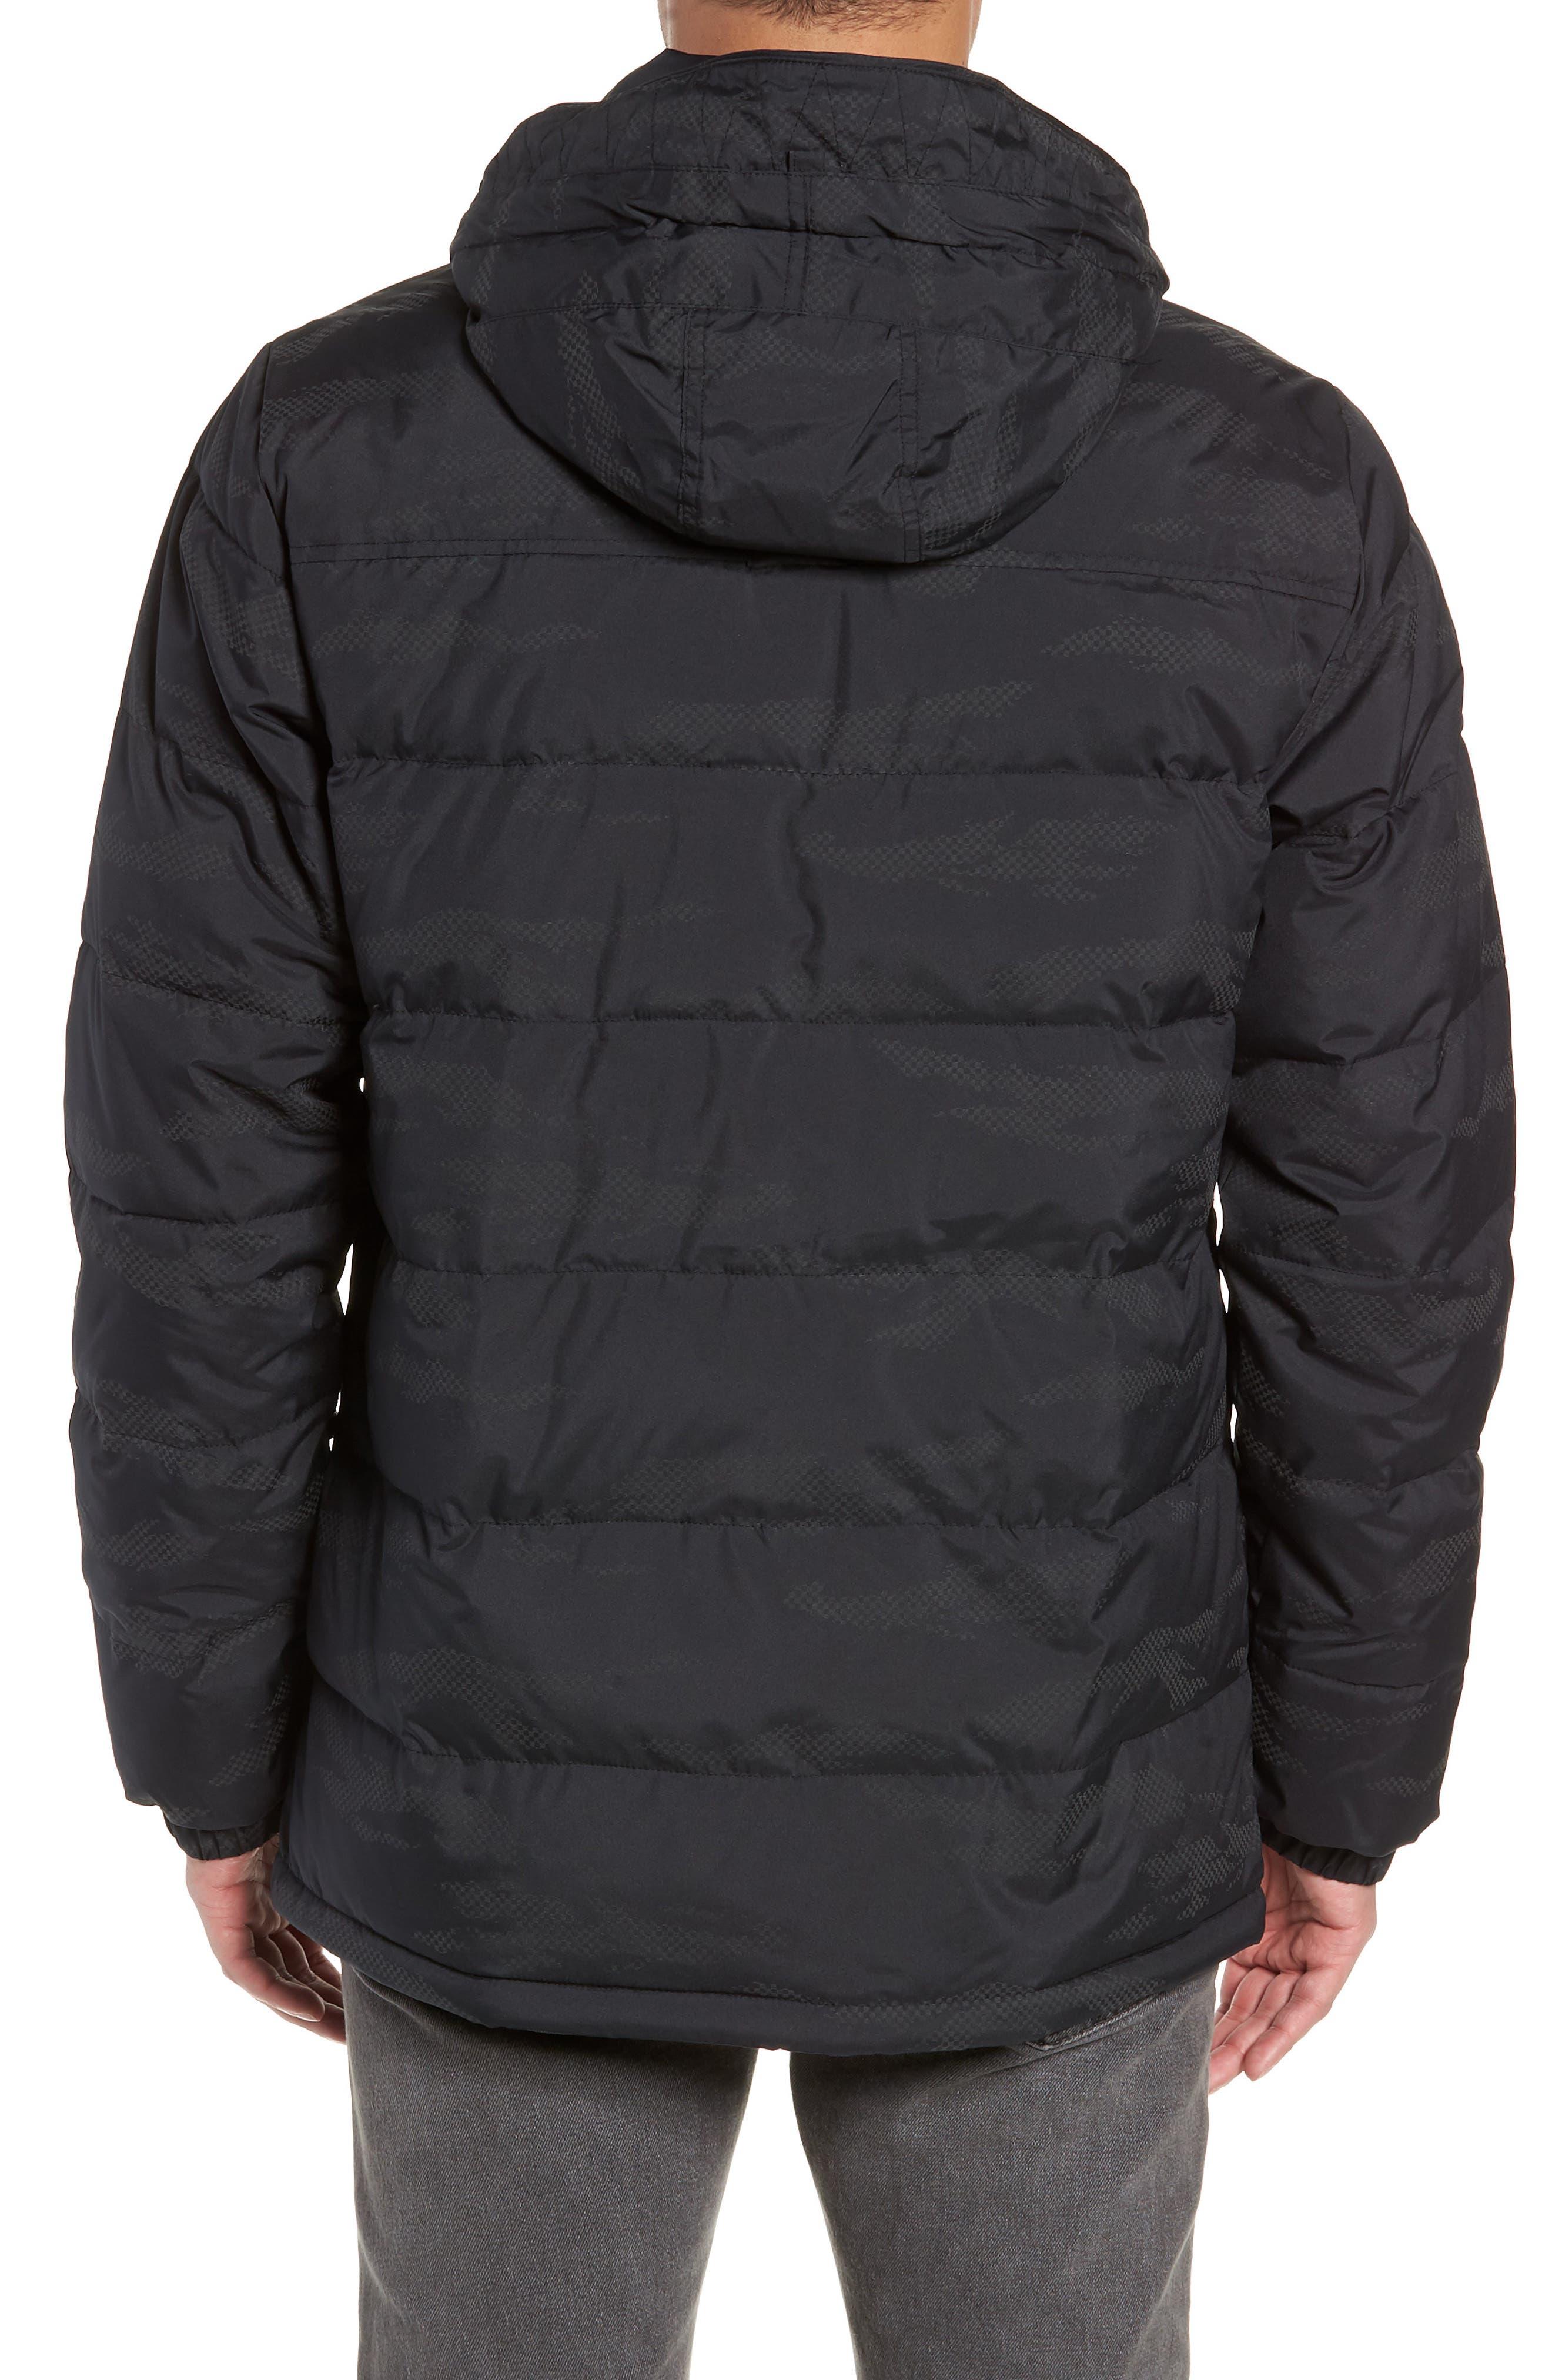 Woodcrest MTE Jacket,                             Alternate thumbnail 2, color,                             BLACK REFLECTIVE